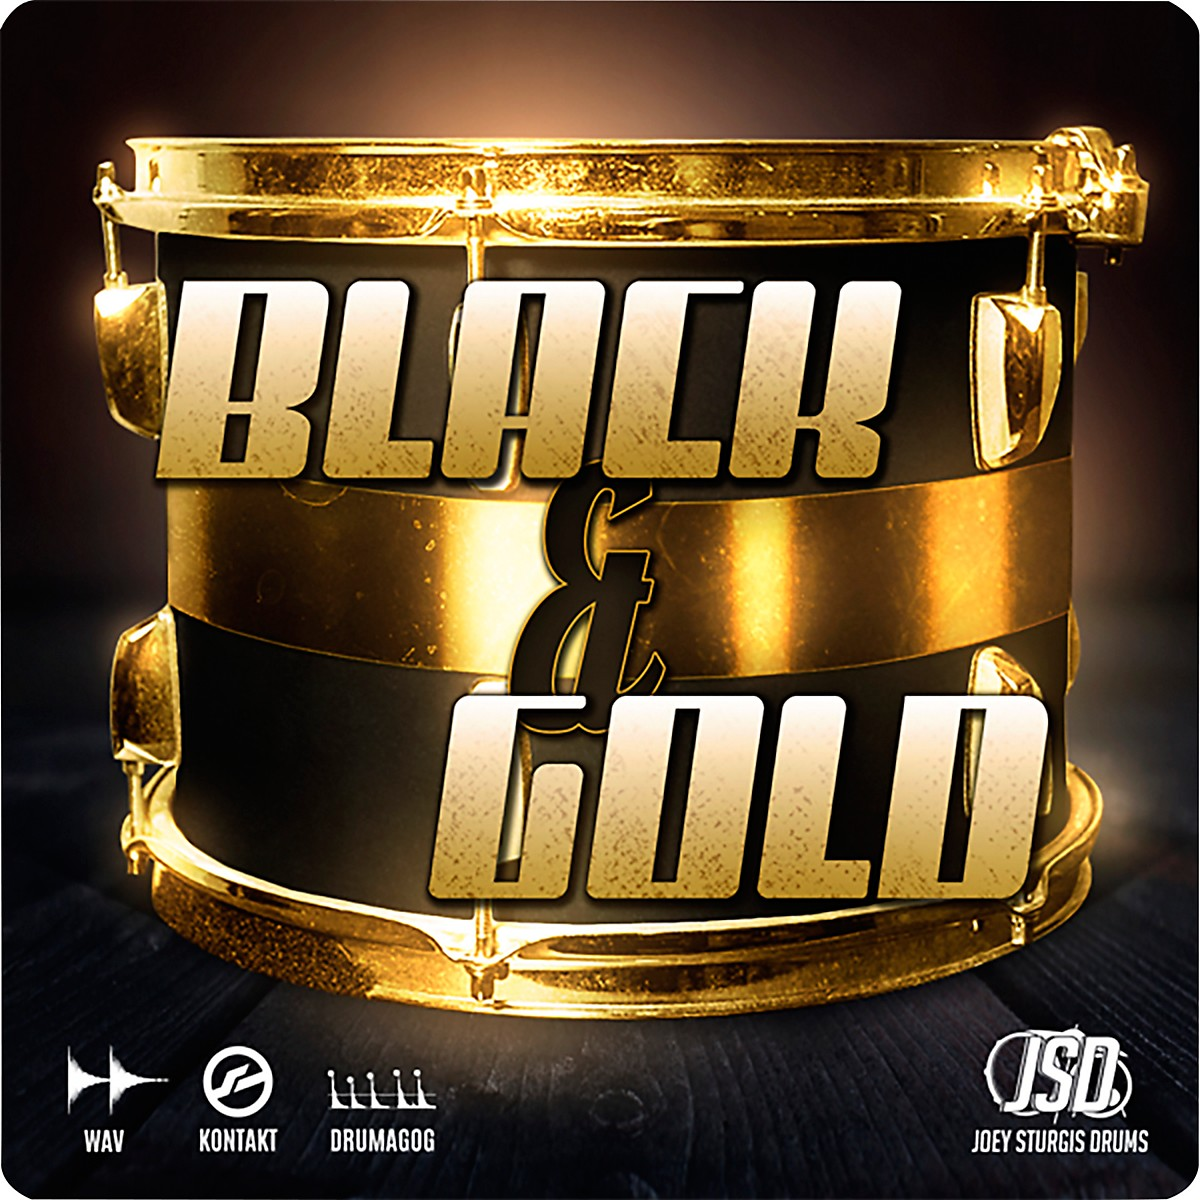 Joey Sturgis Drums Black & Gold Full